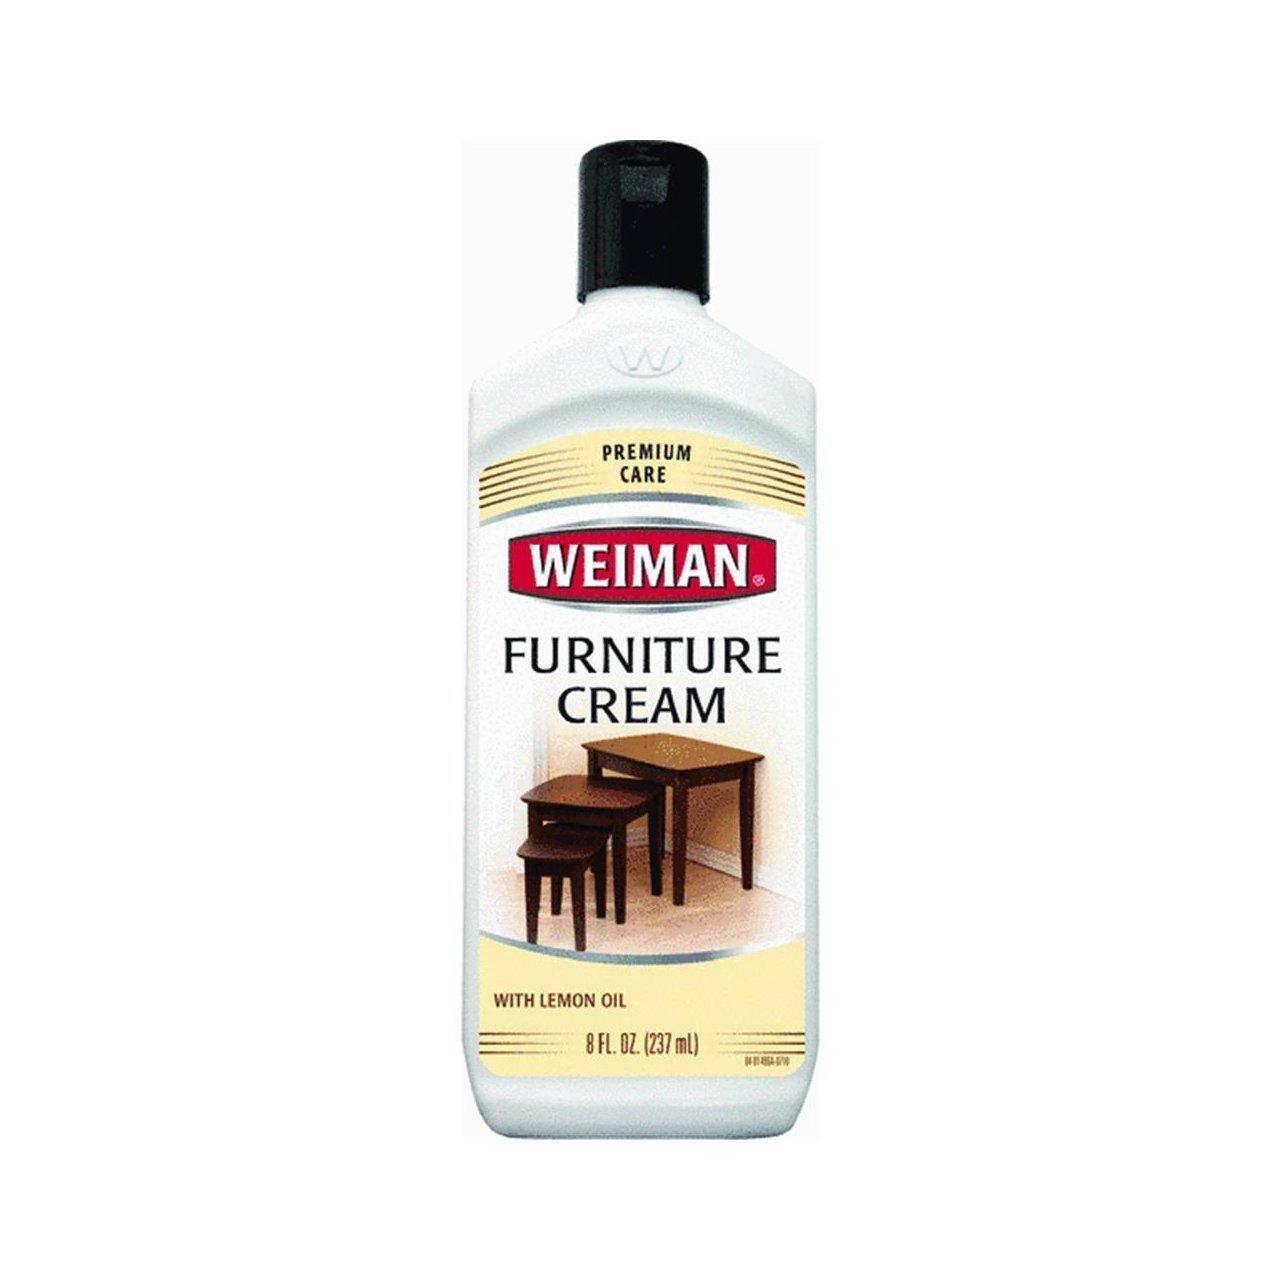 Amazon.com: Weiman Furniture Cream with Lemon Oil, 8 fl oz.: Home ...